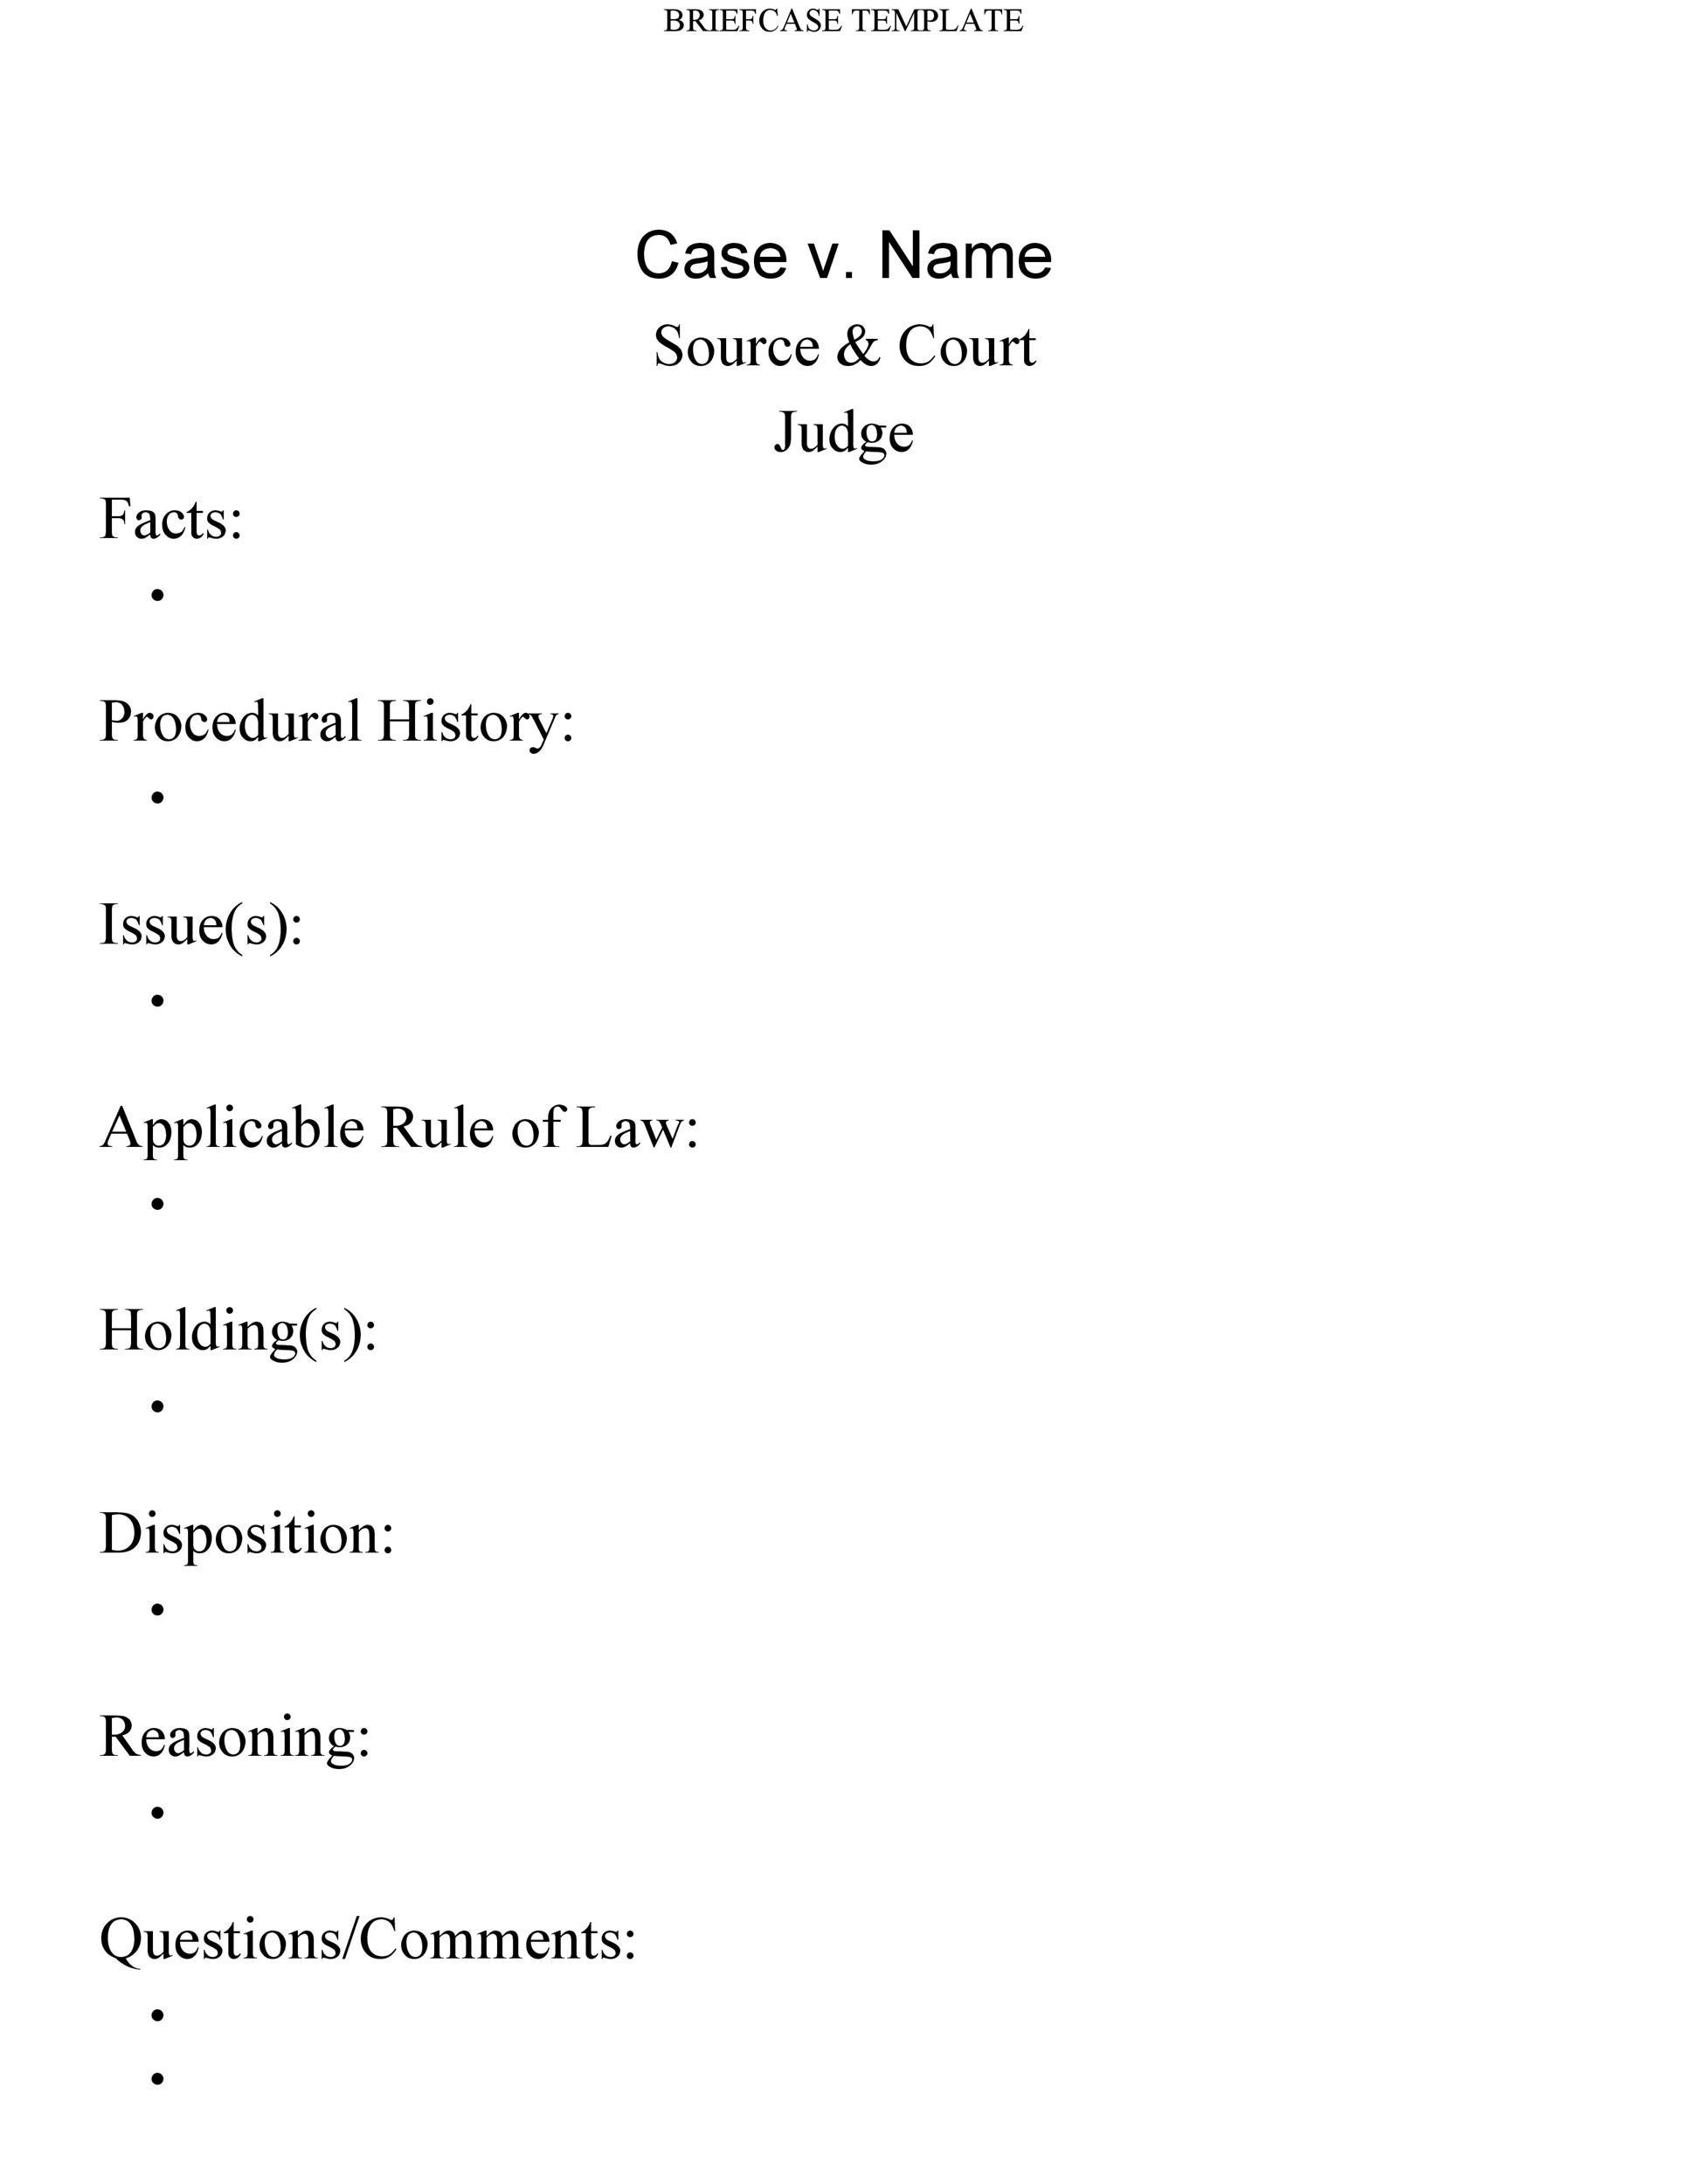 Free case brief template 10